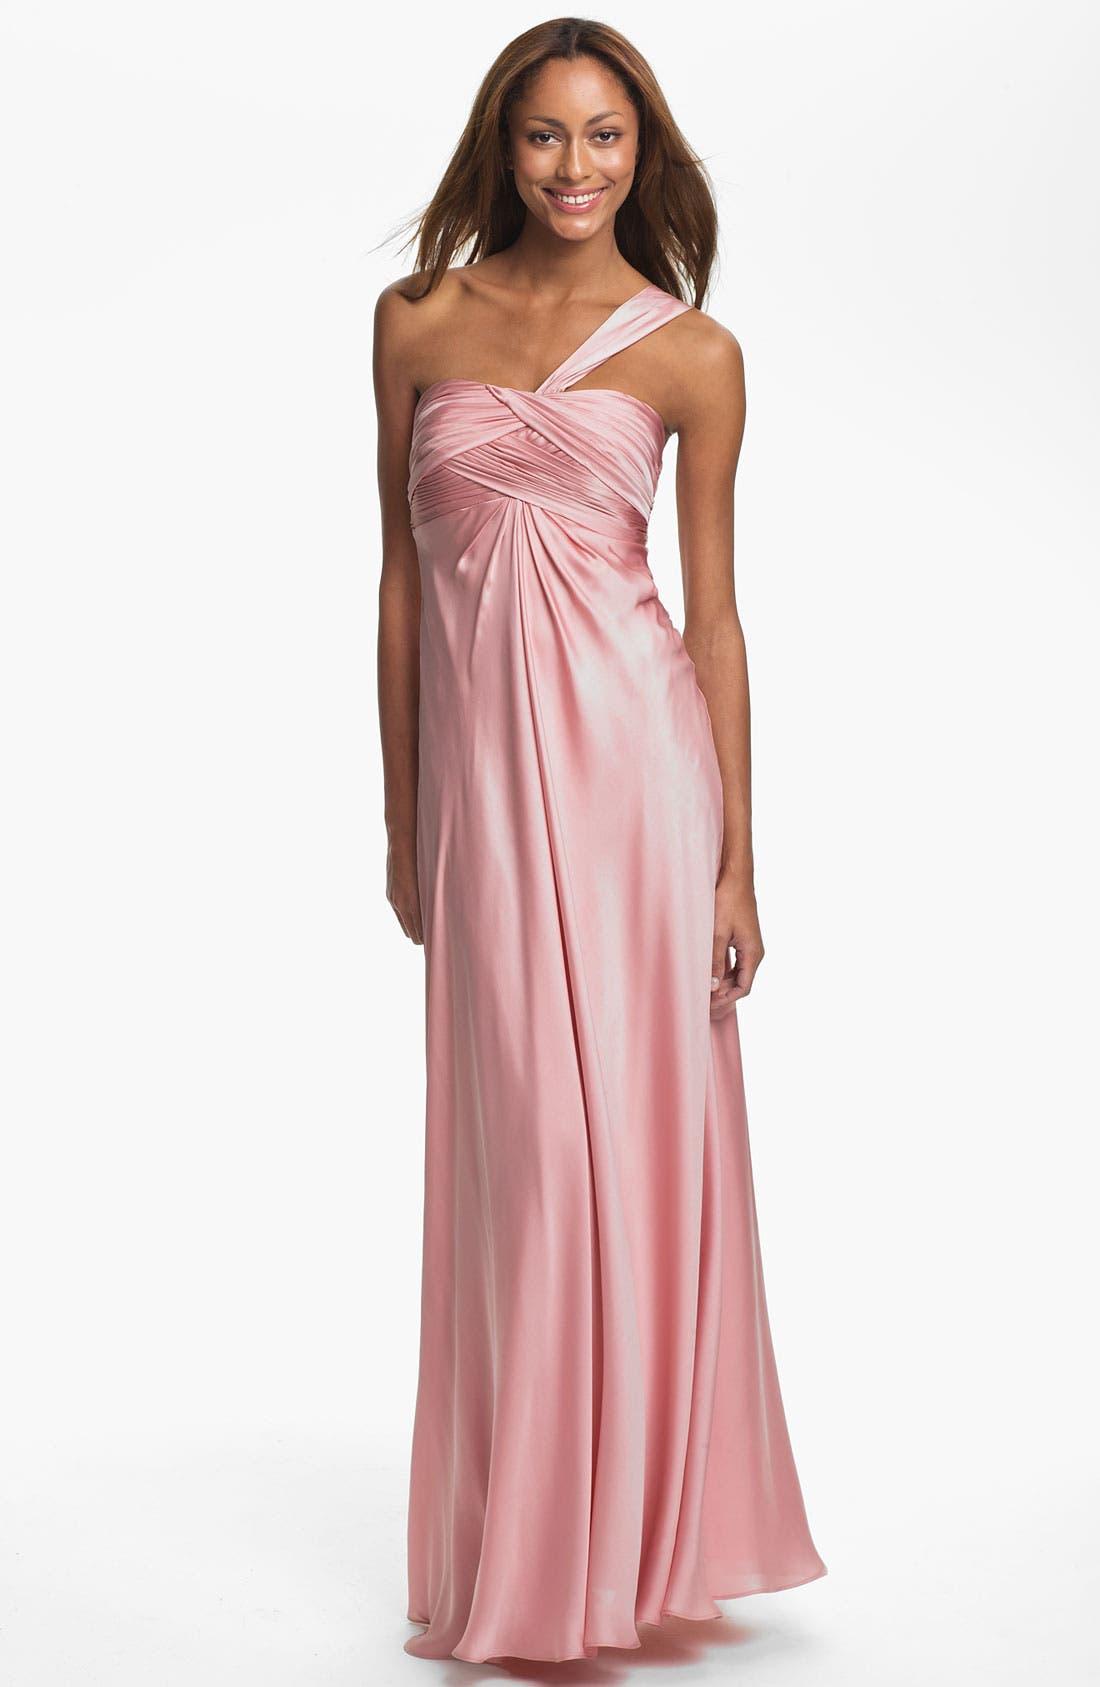 Alternate Image 1 Selected - ML Monique Lhuillier Bridesmaids One Shoulder Gown (Nordstrom Exclusive)